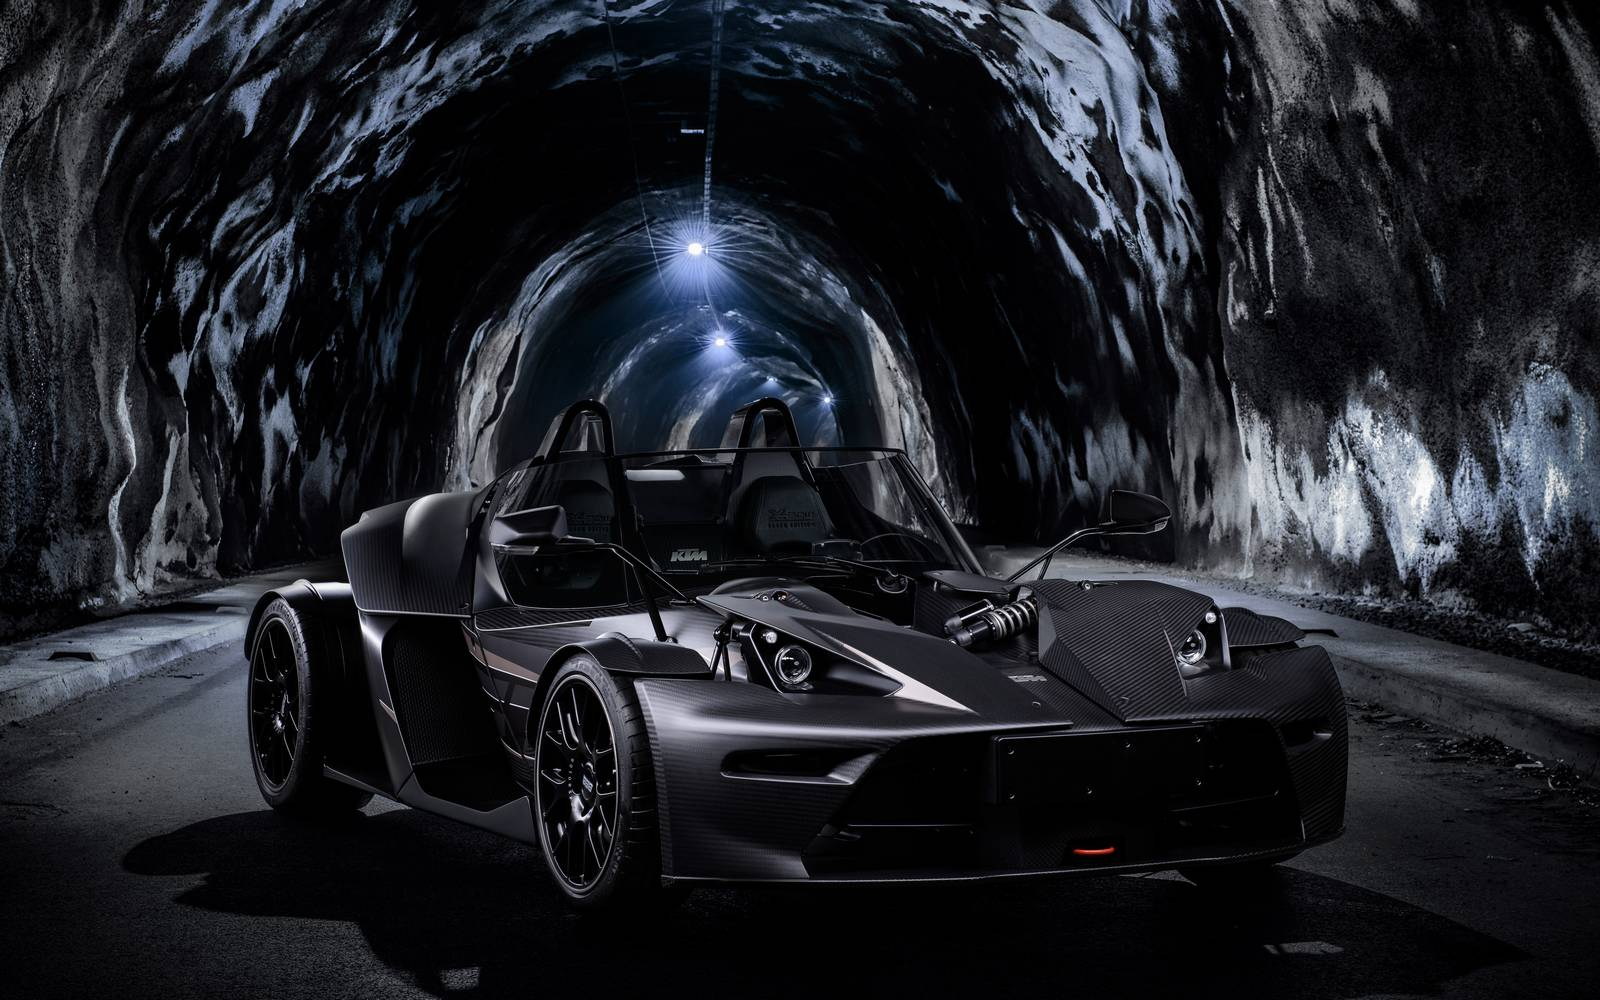 2018 ktm x bow.  2018 ktm xbow black edition car with 2018 ktm x bow